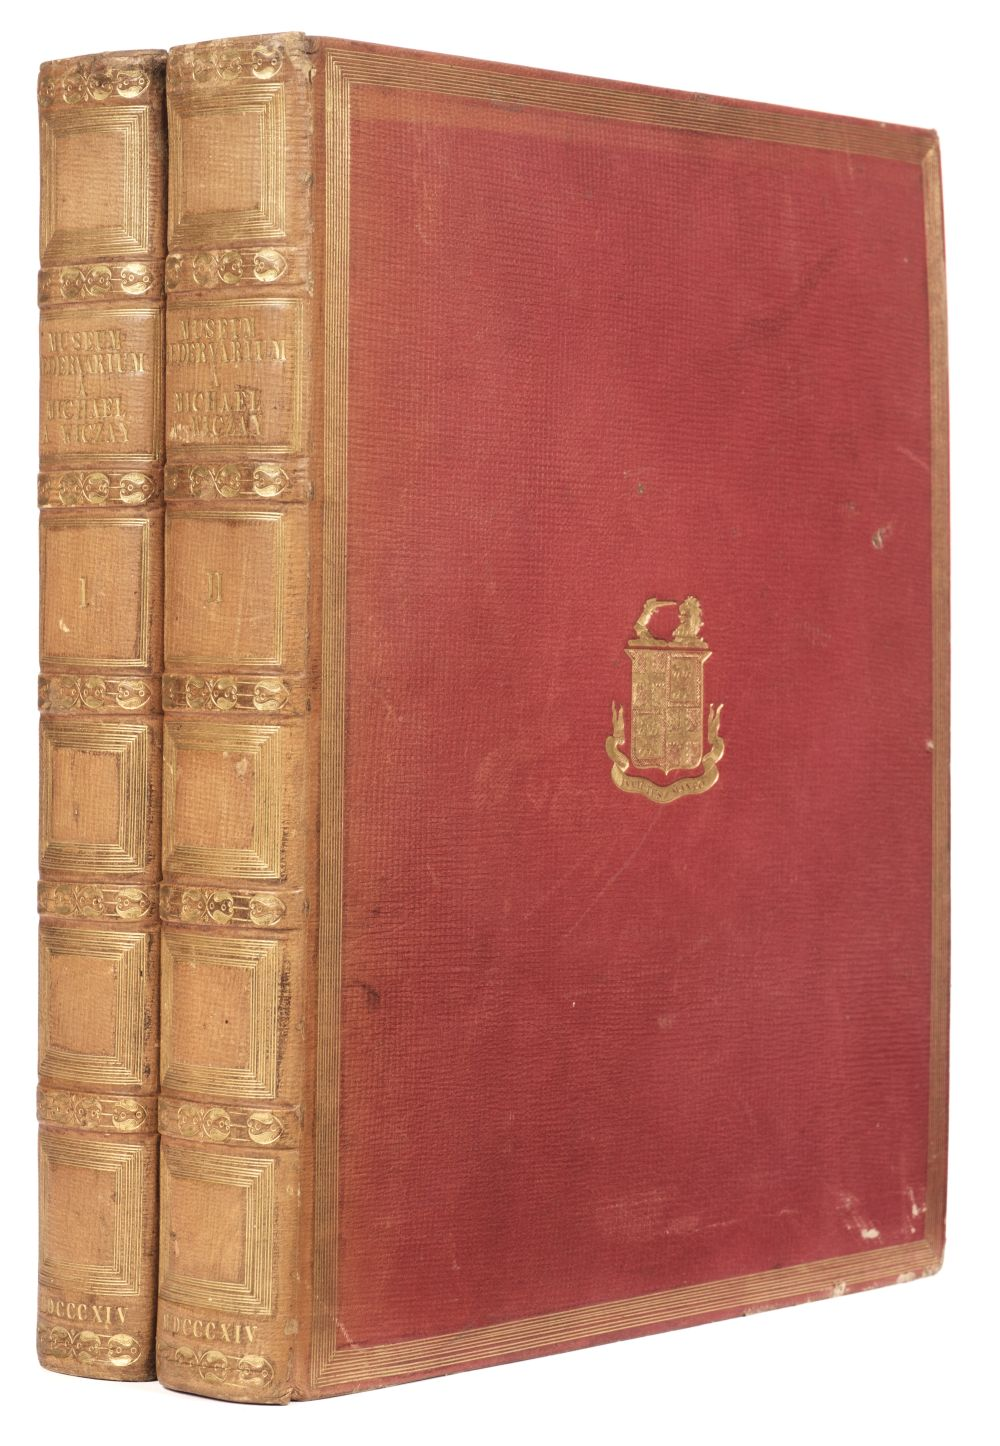 Viczay (Mihaly). Musei Hedervarii in Hungaria numos antiquos ... descripsit, 1st edition, 1814